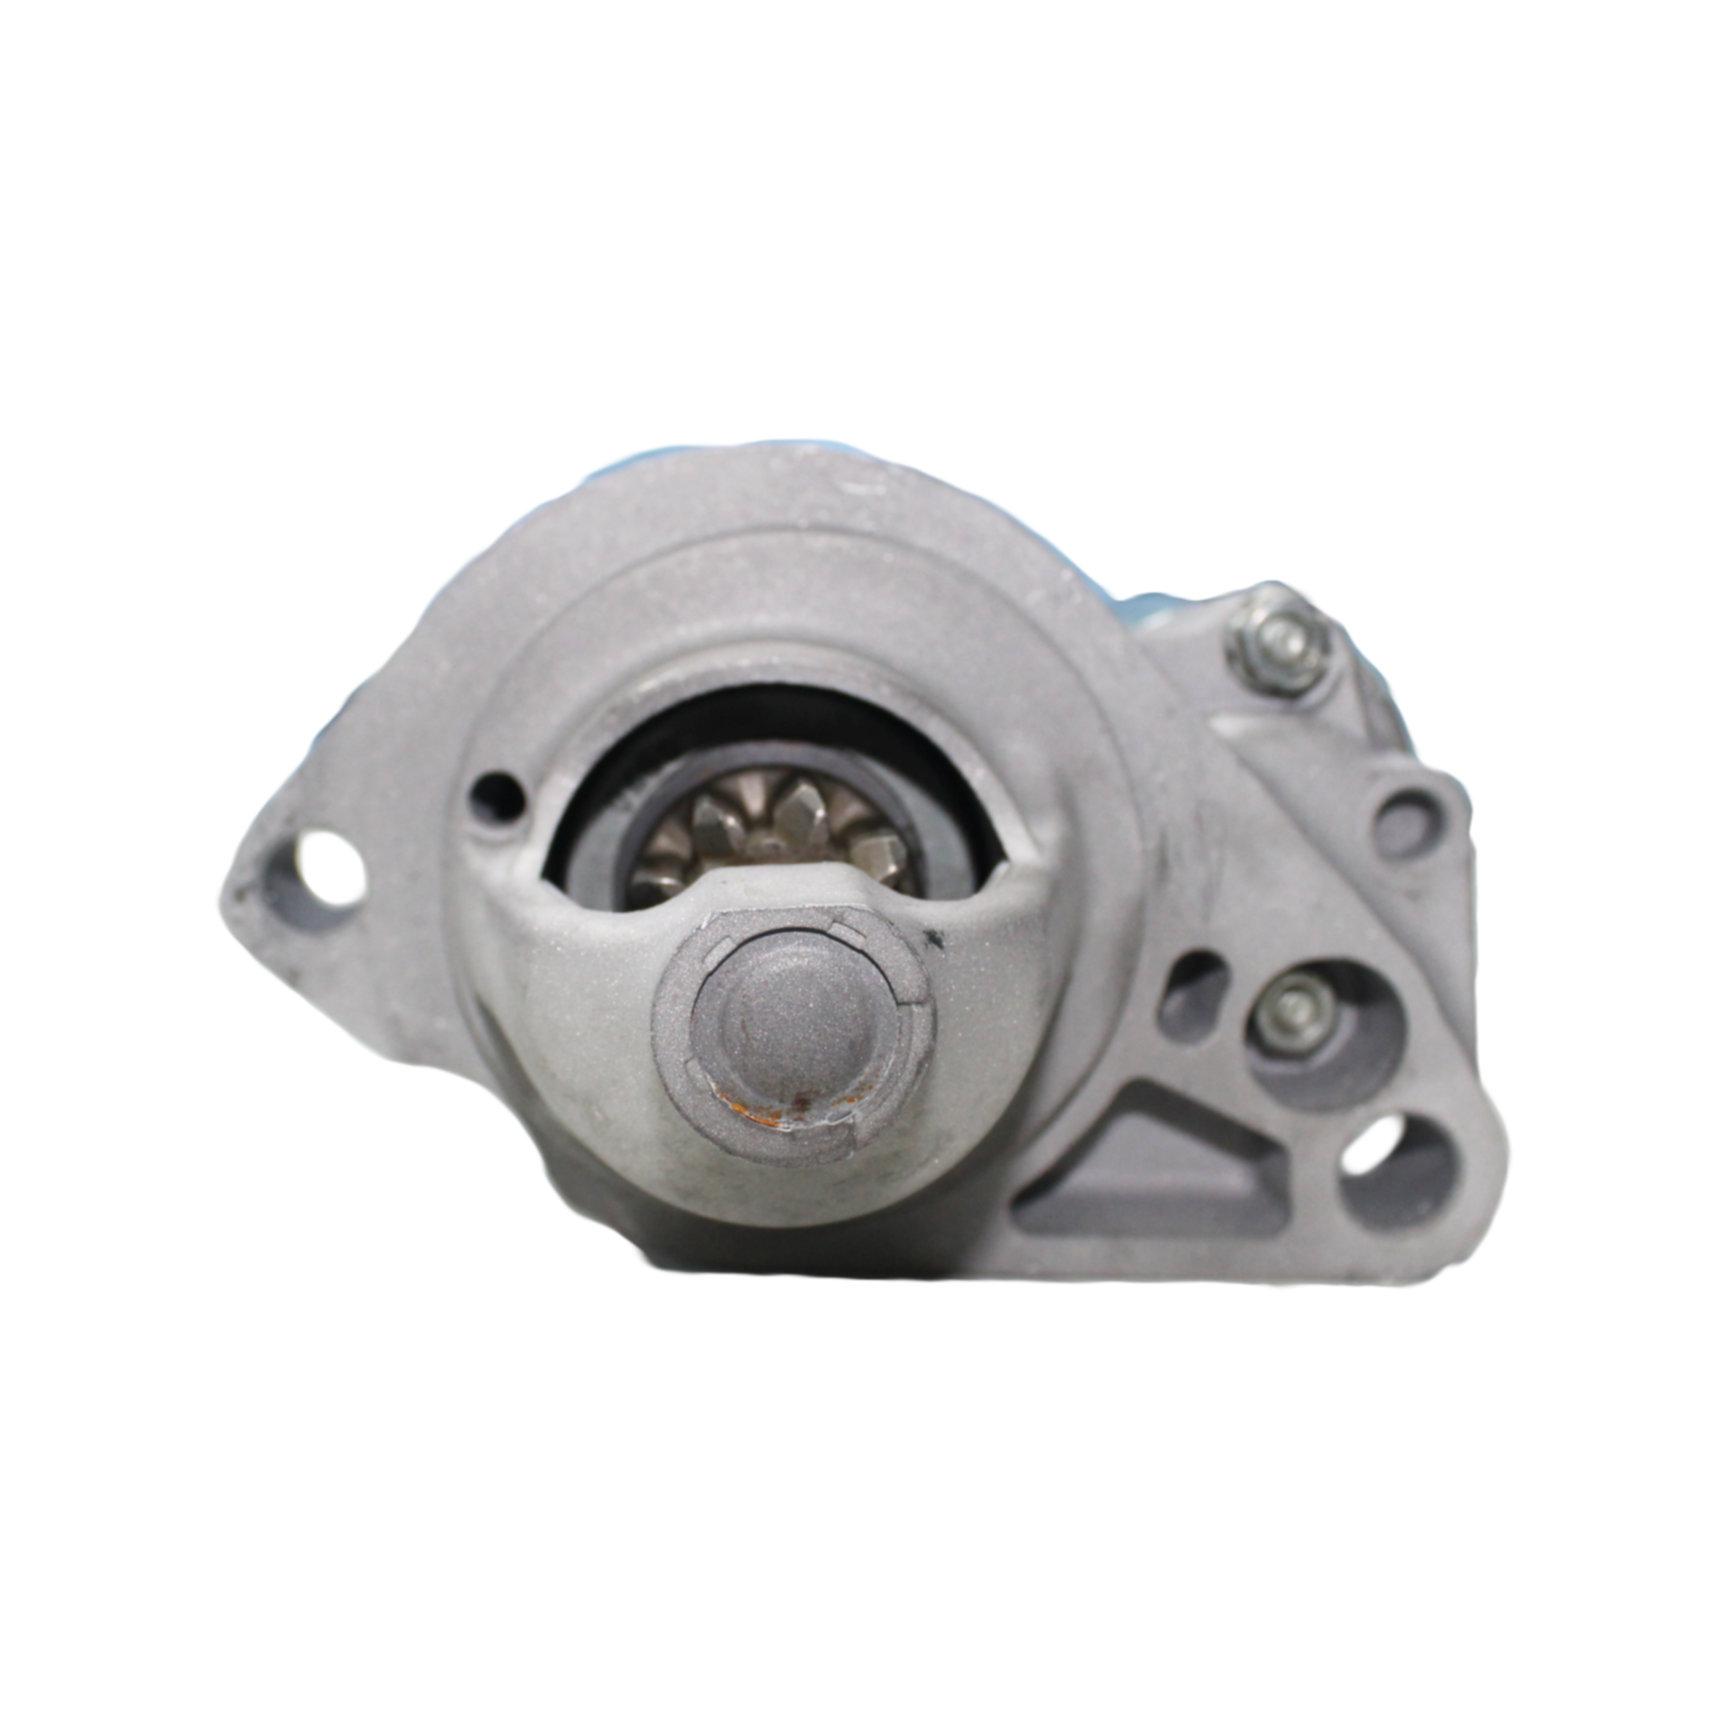 Motor de Arranque Partida Honda Civic 06...09 4280003420